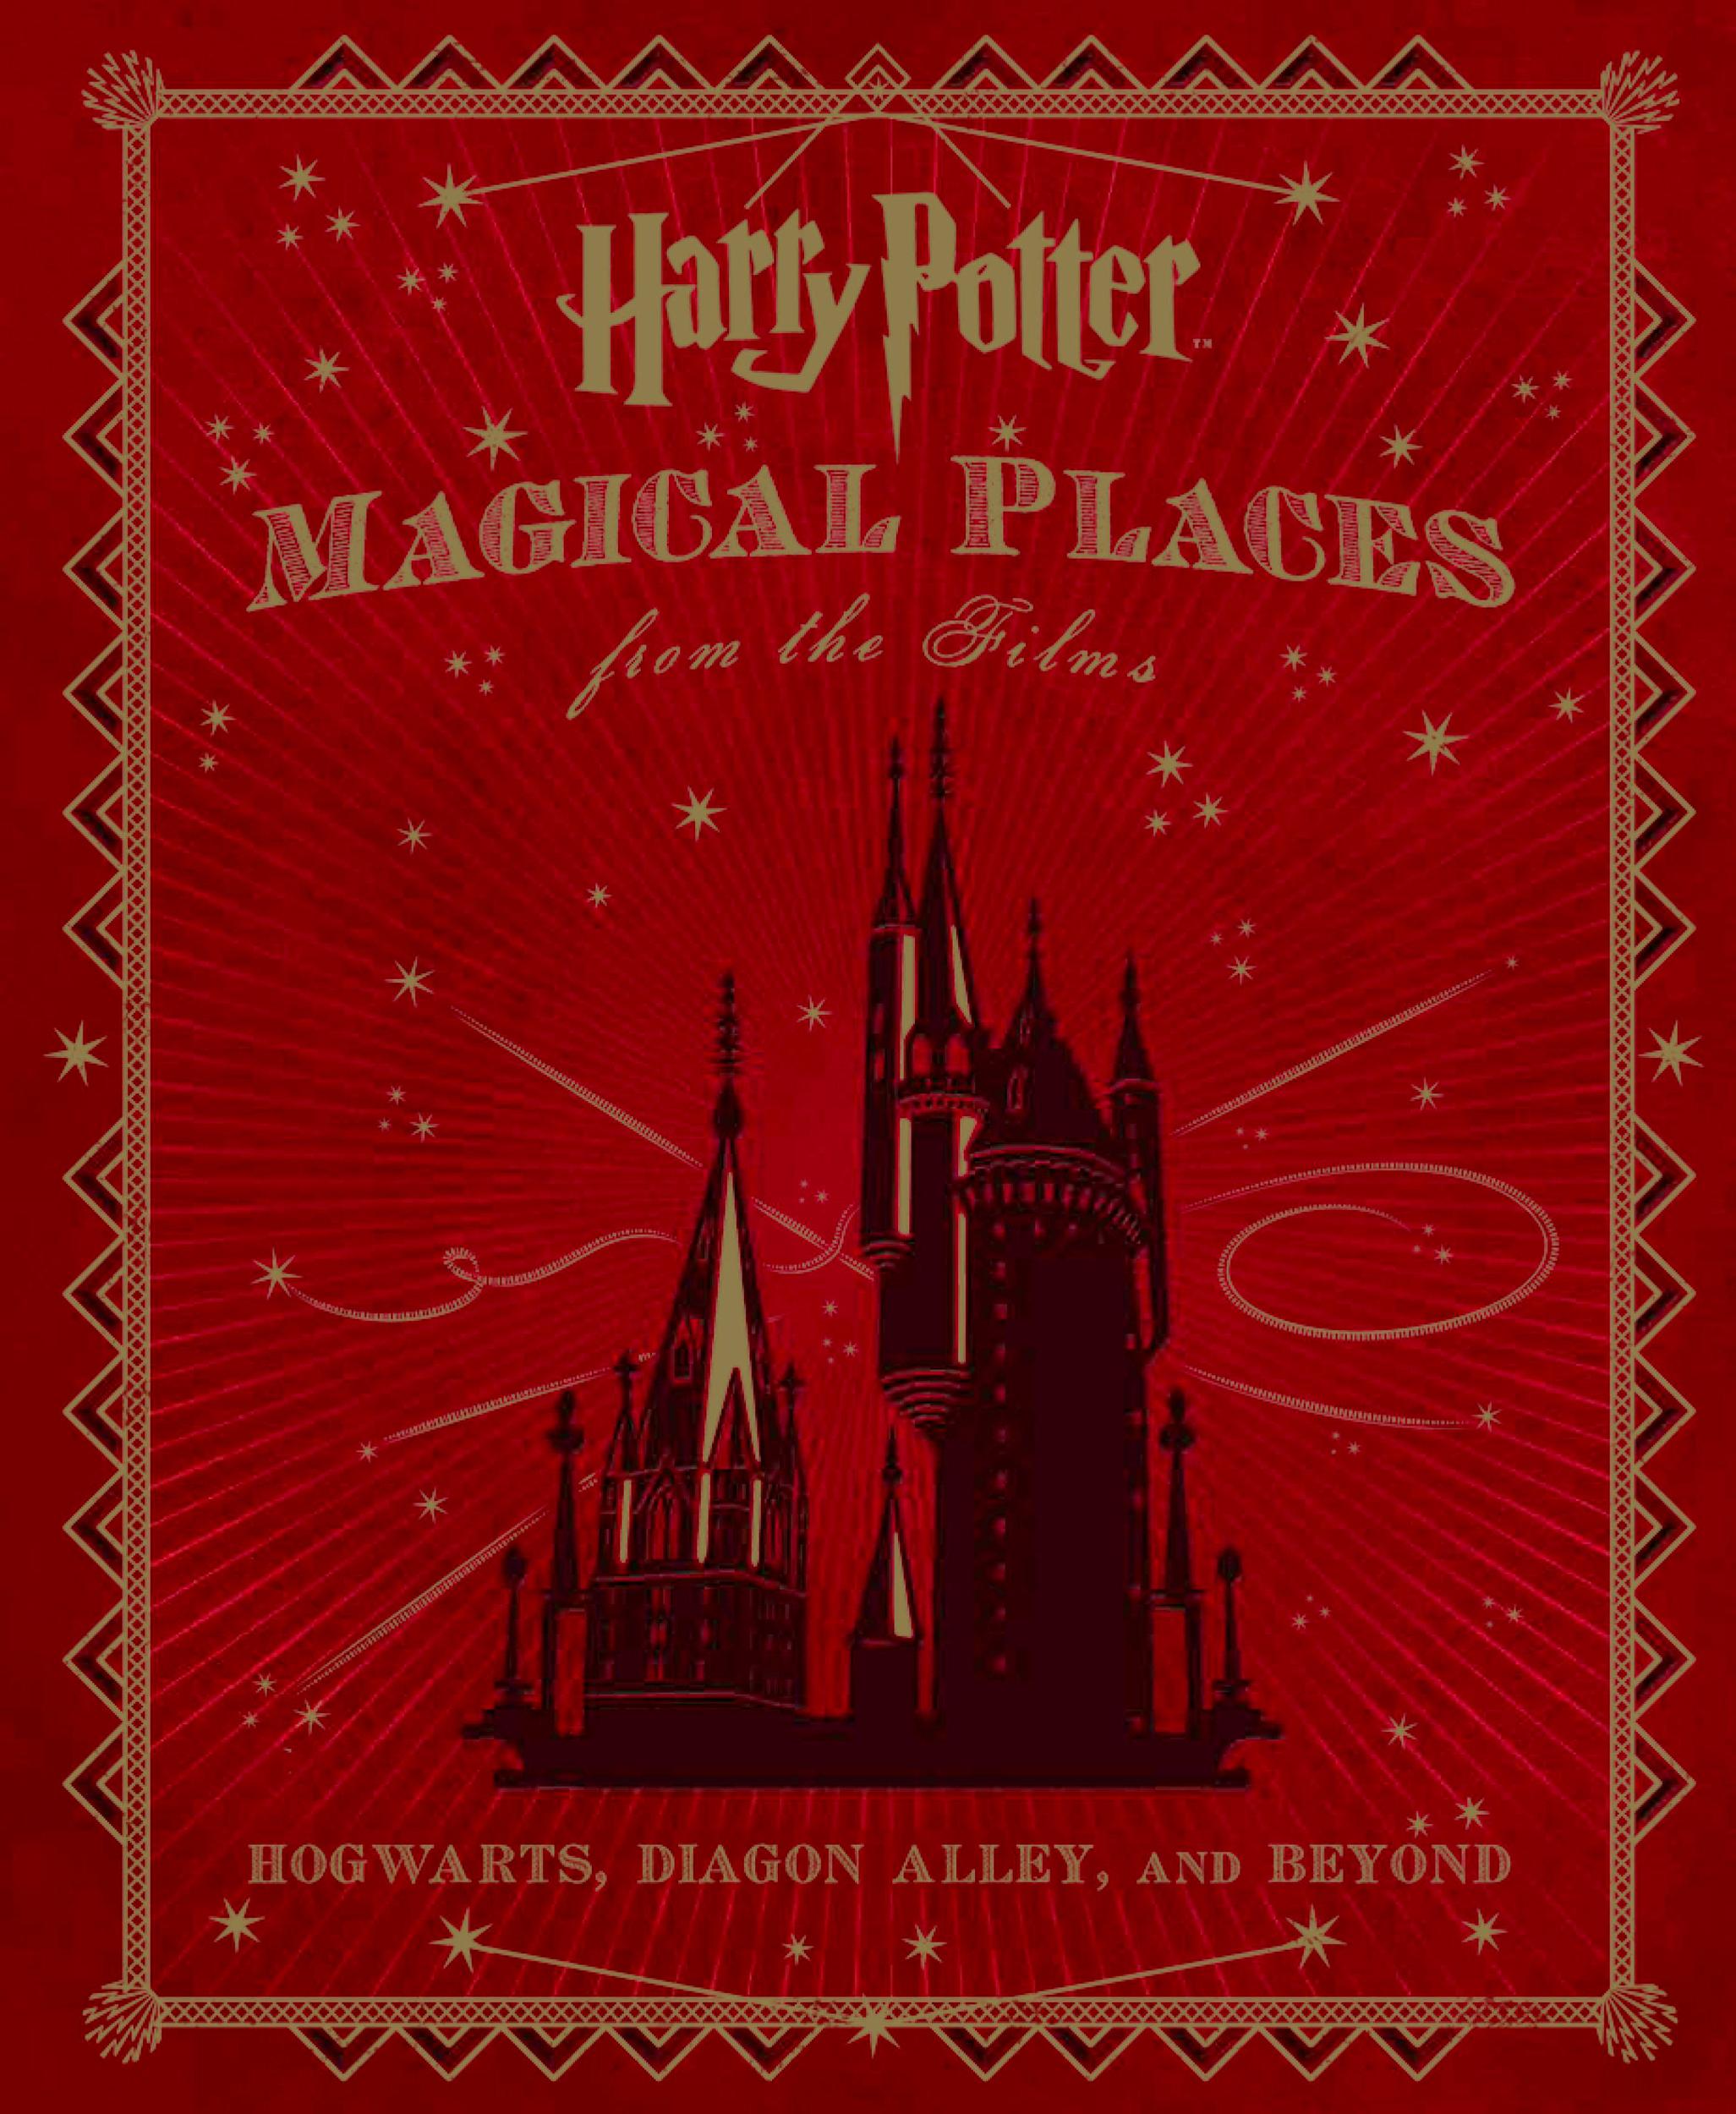 Datei:HarryPotterMagicalPlacesFromTheFilms.jpg